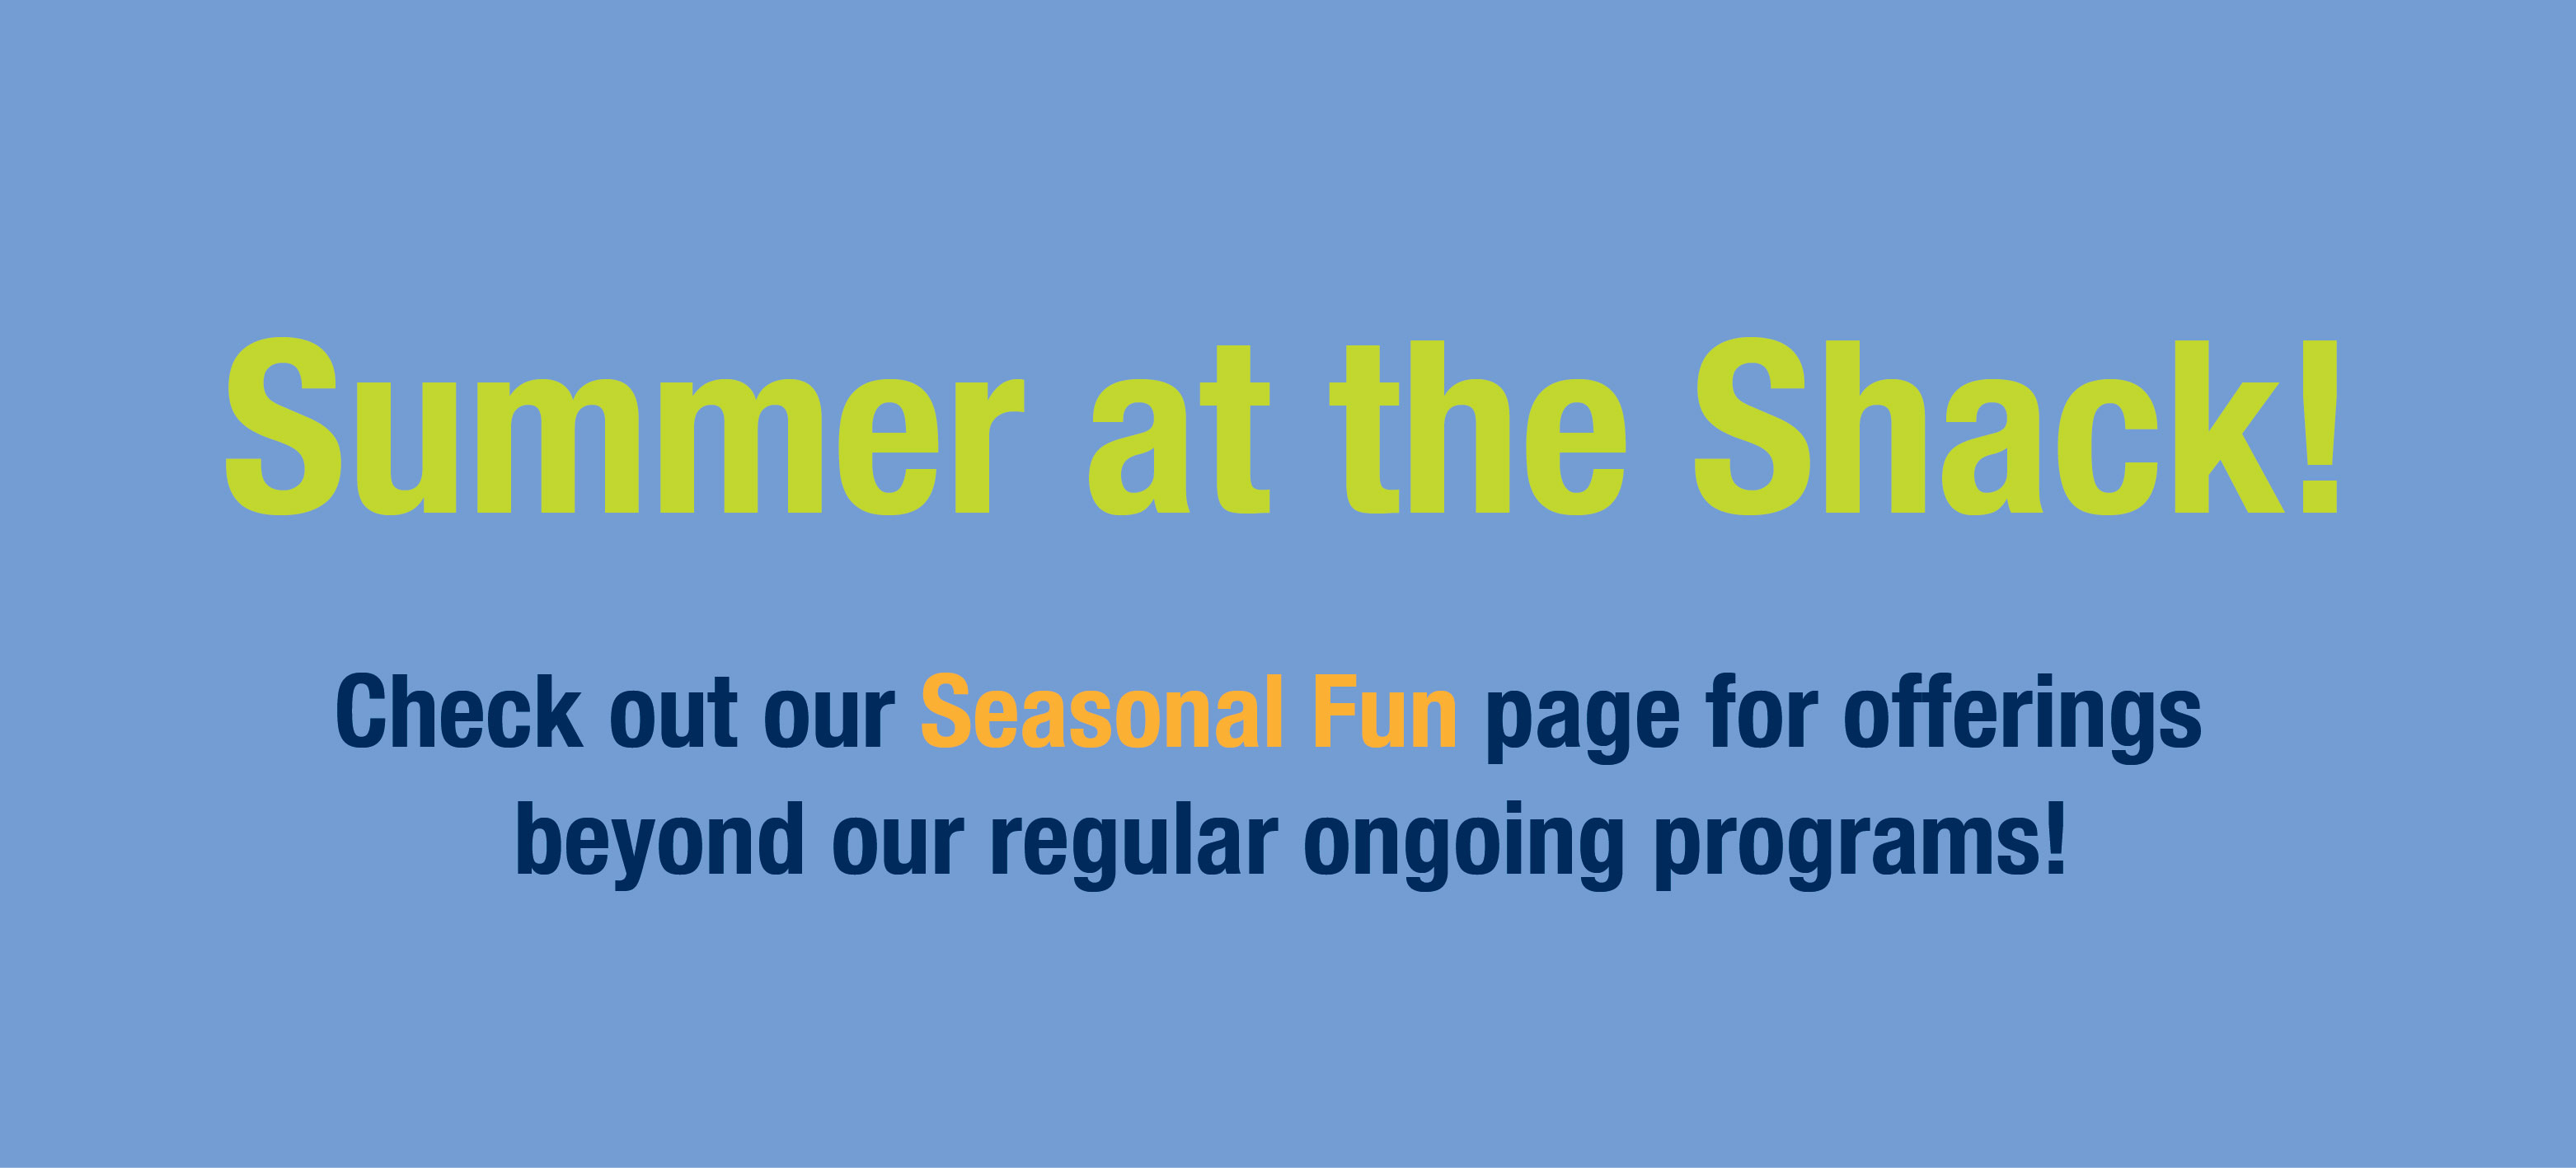 Summer Home Page Slide